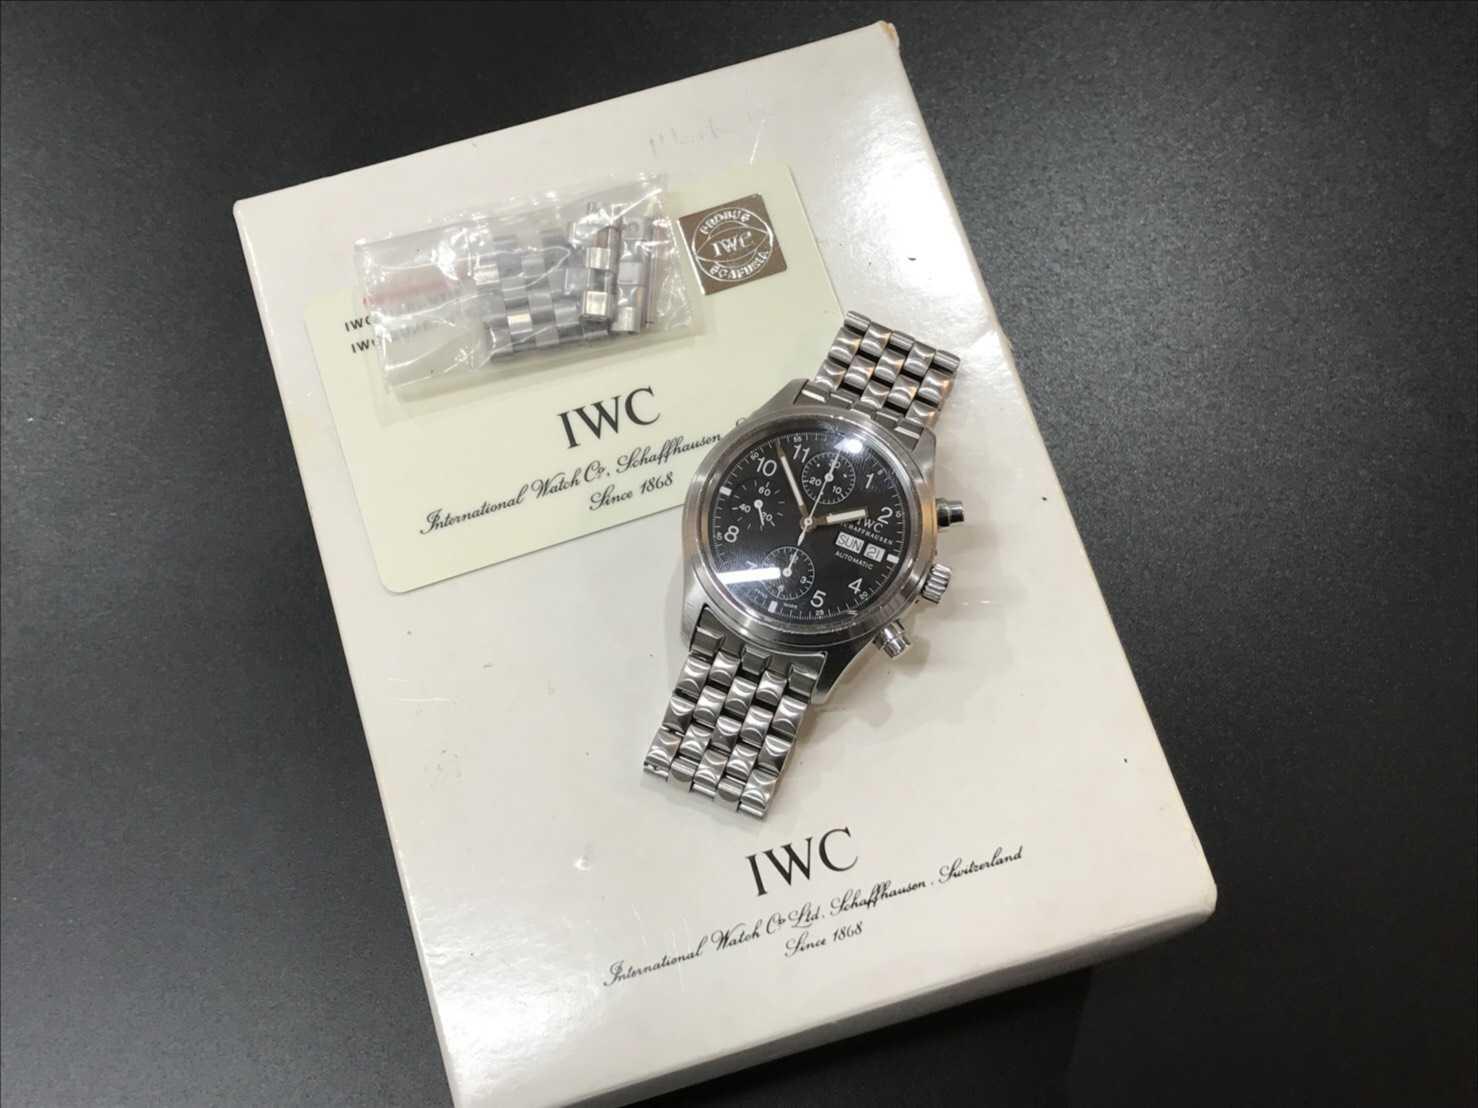 IWC買取 メカニカルフリーガークロノグラフ